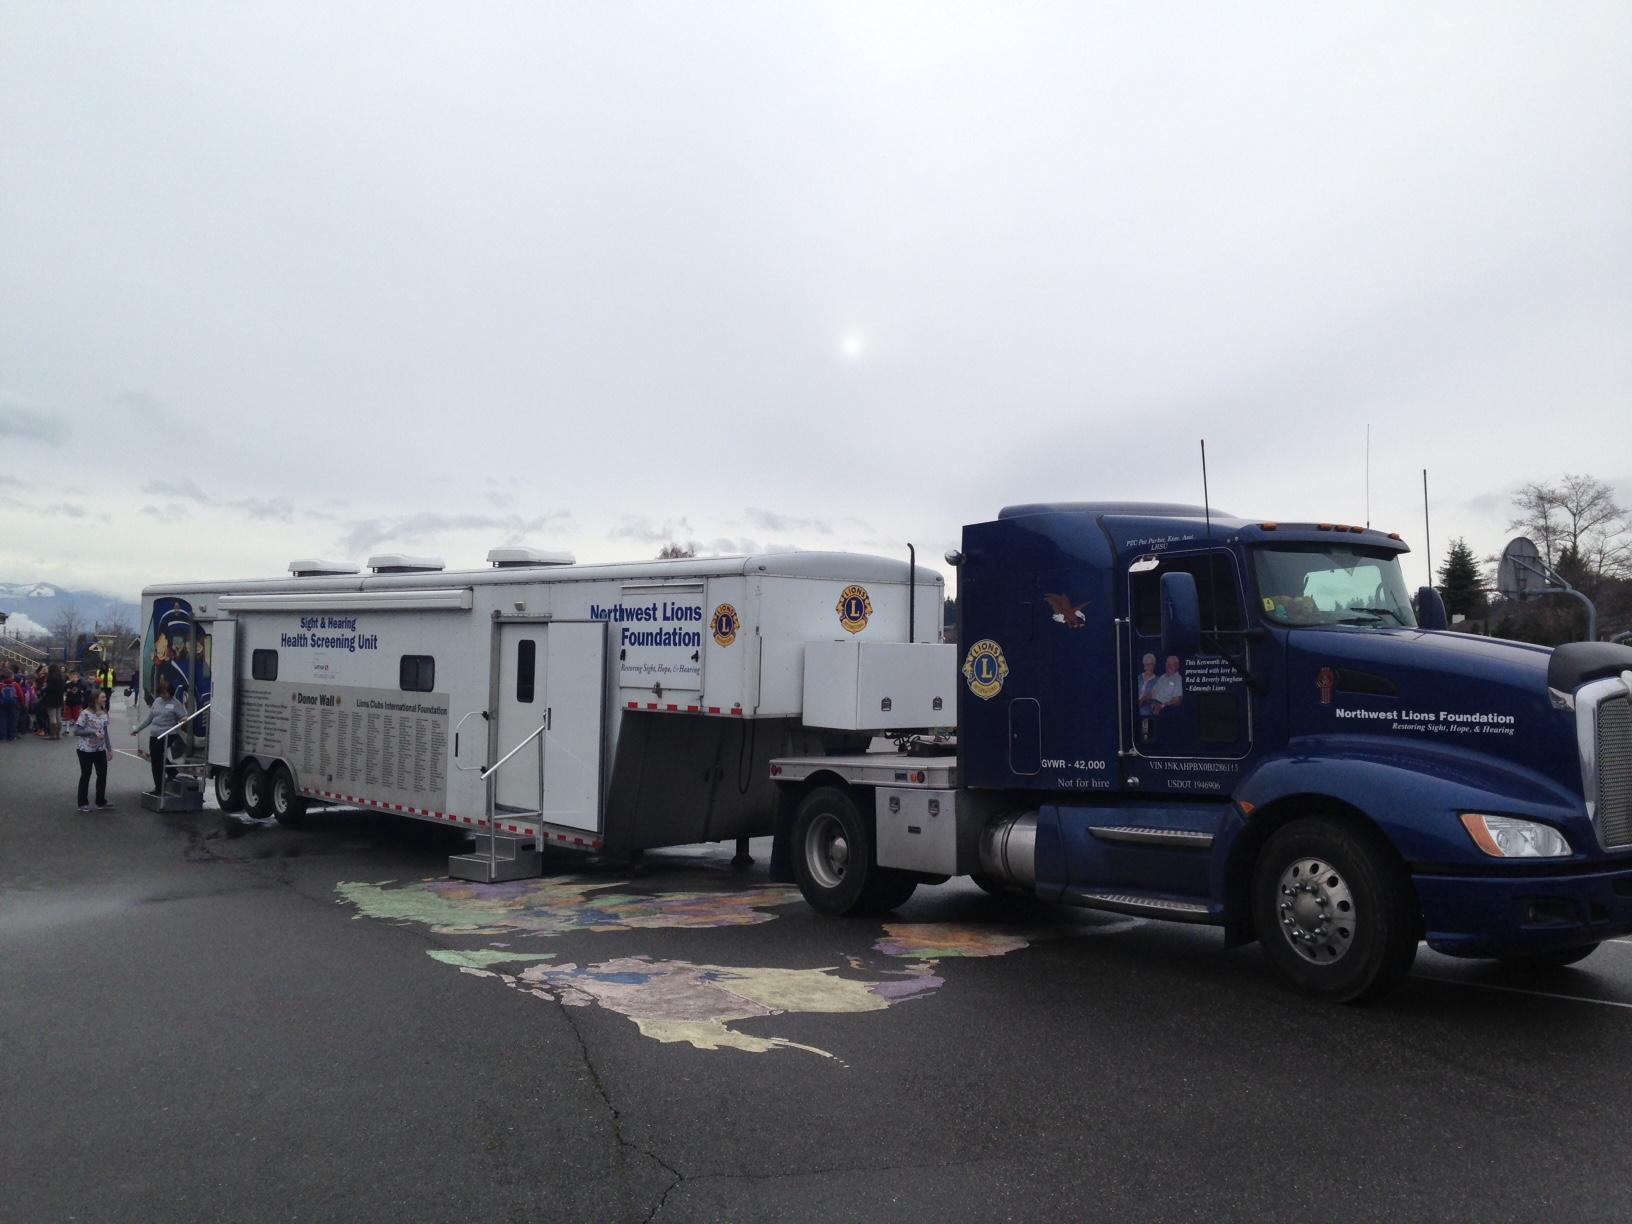 Vision and Hearing Screening Van: